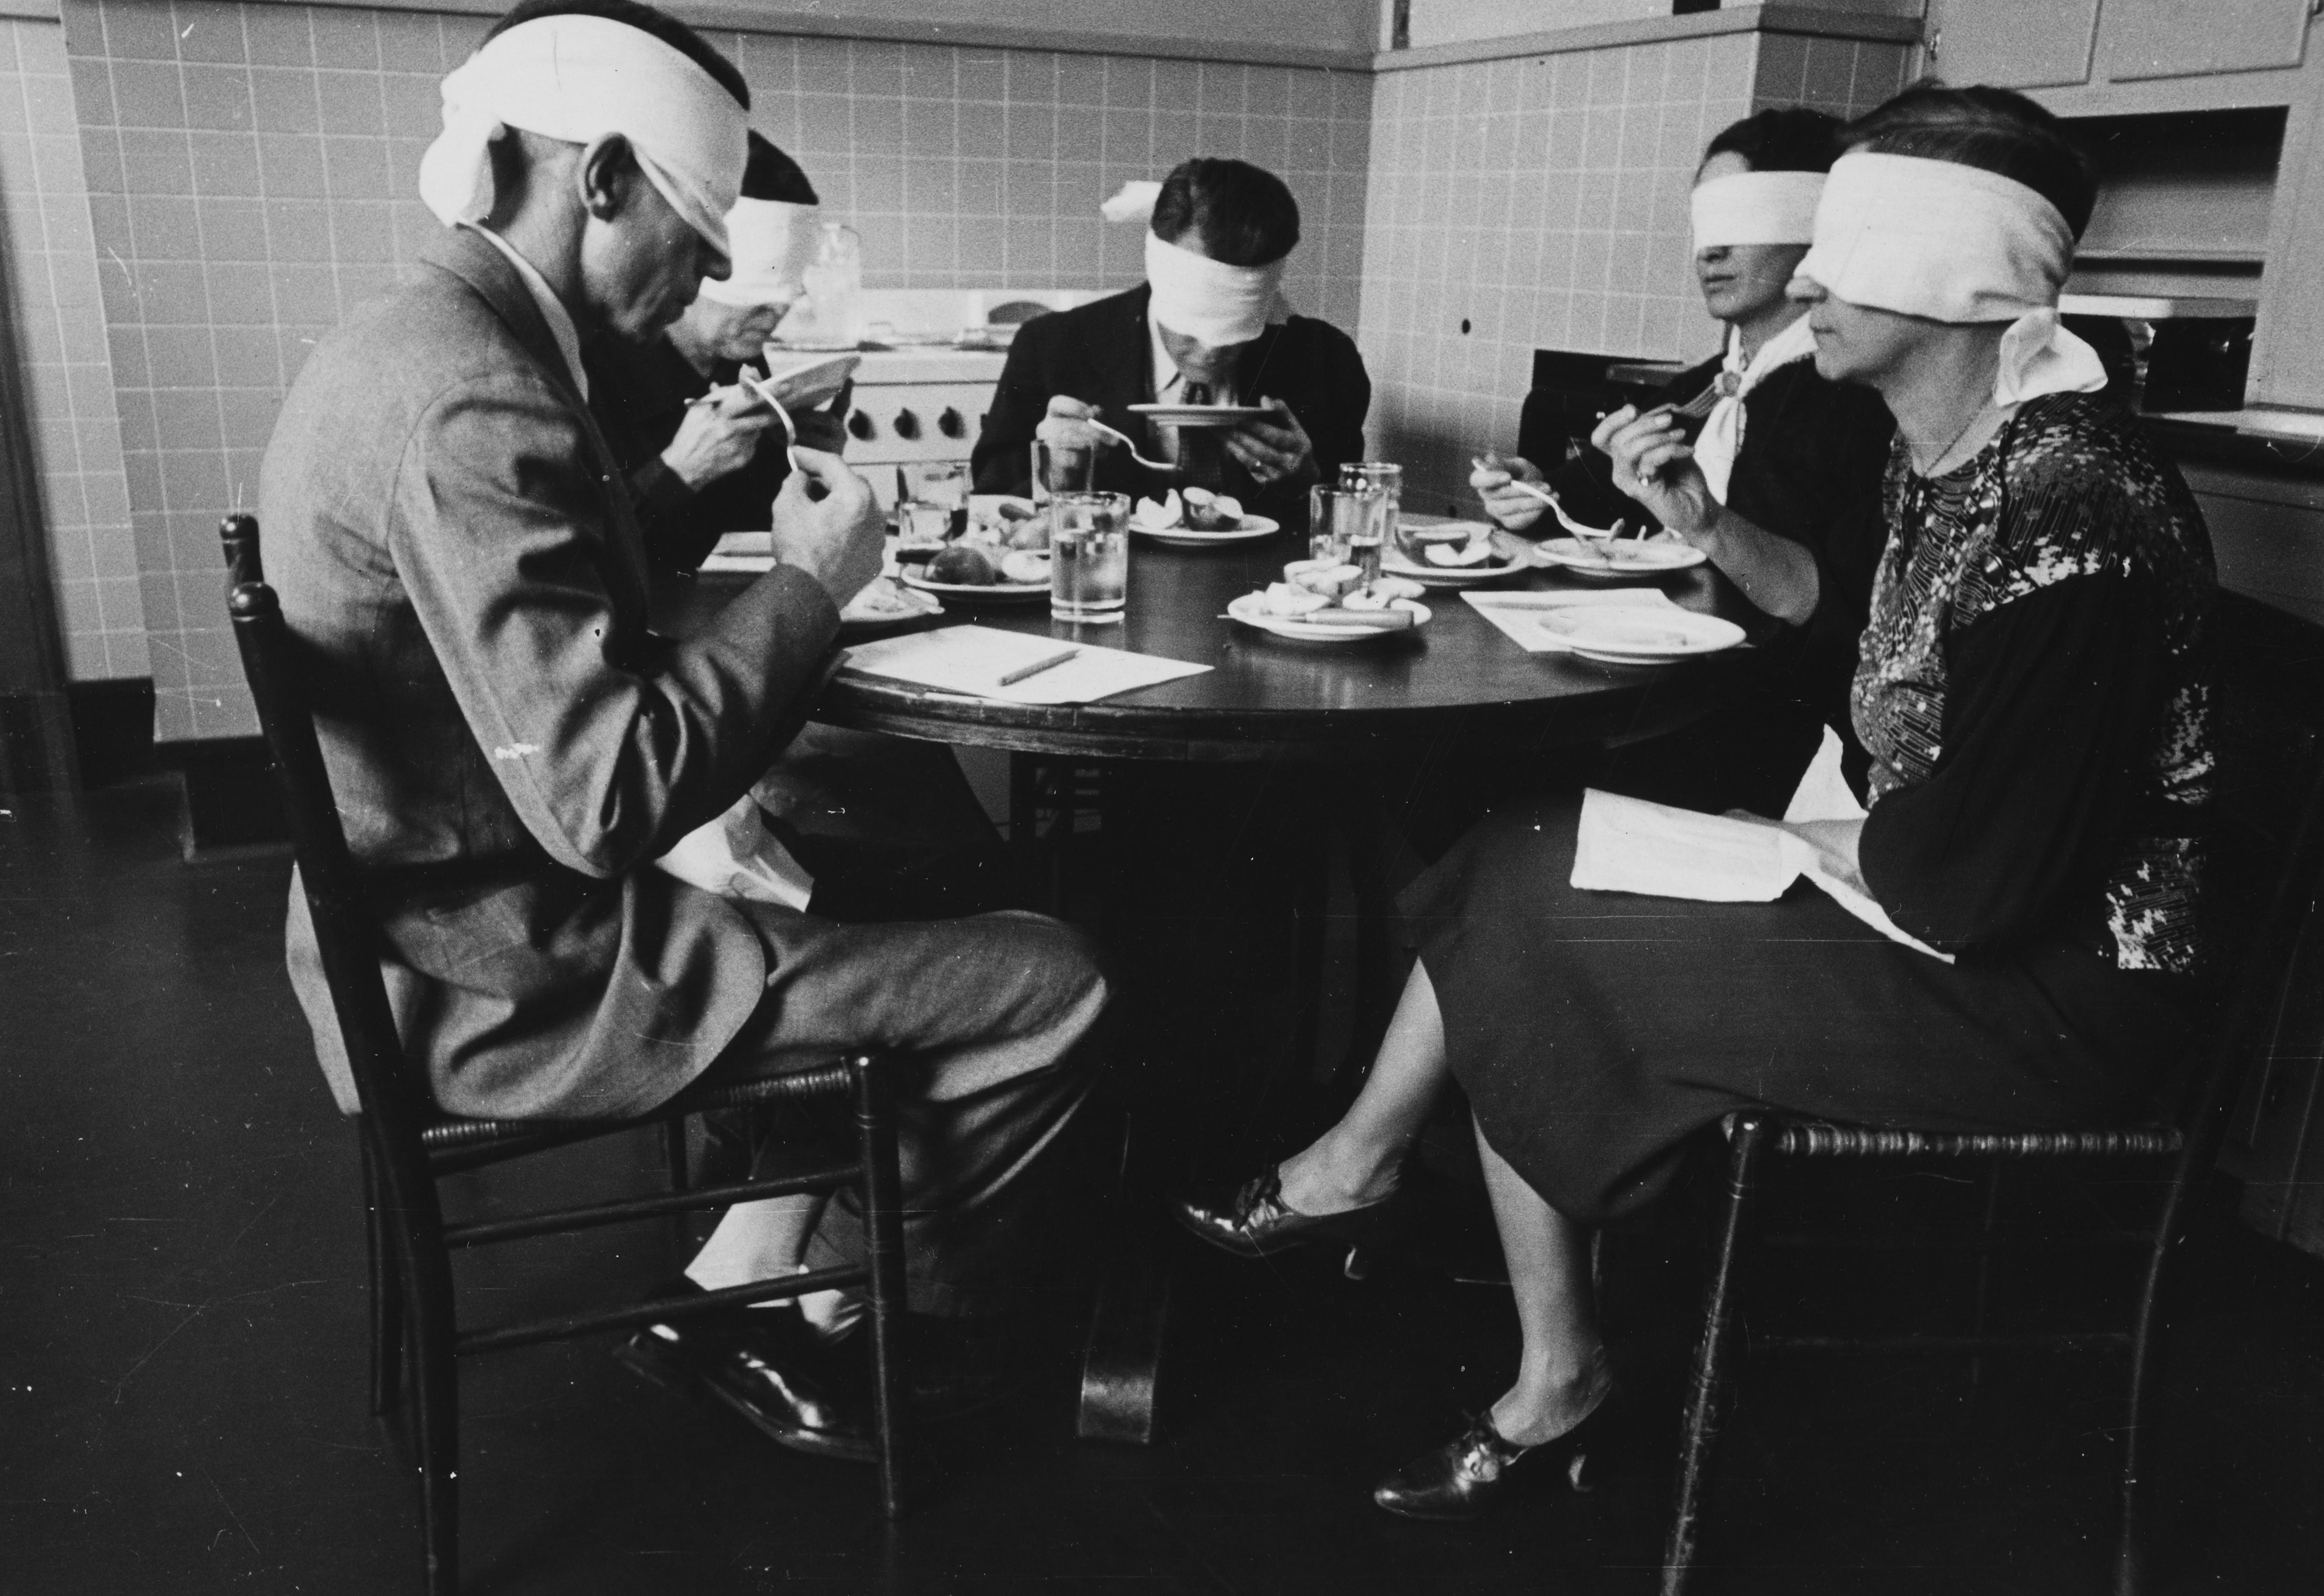 Blindfolded Focus Group In Taste Test